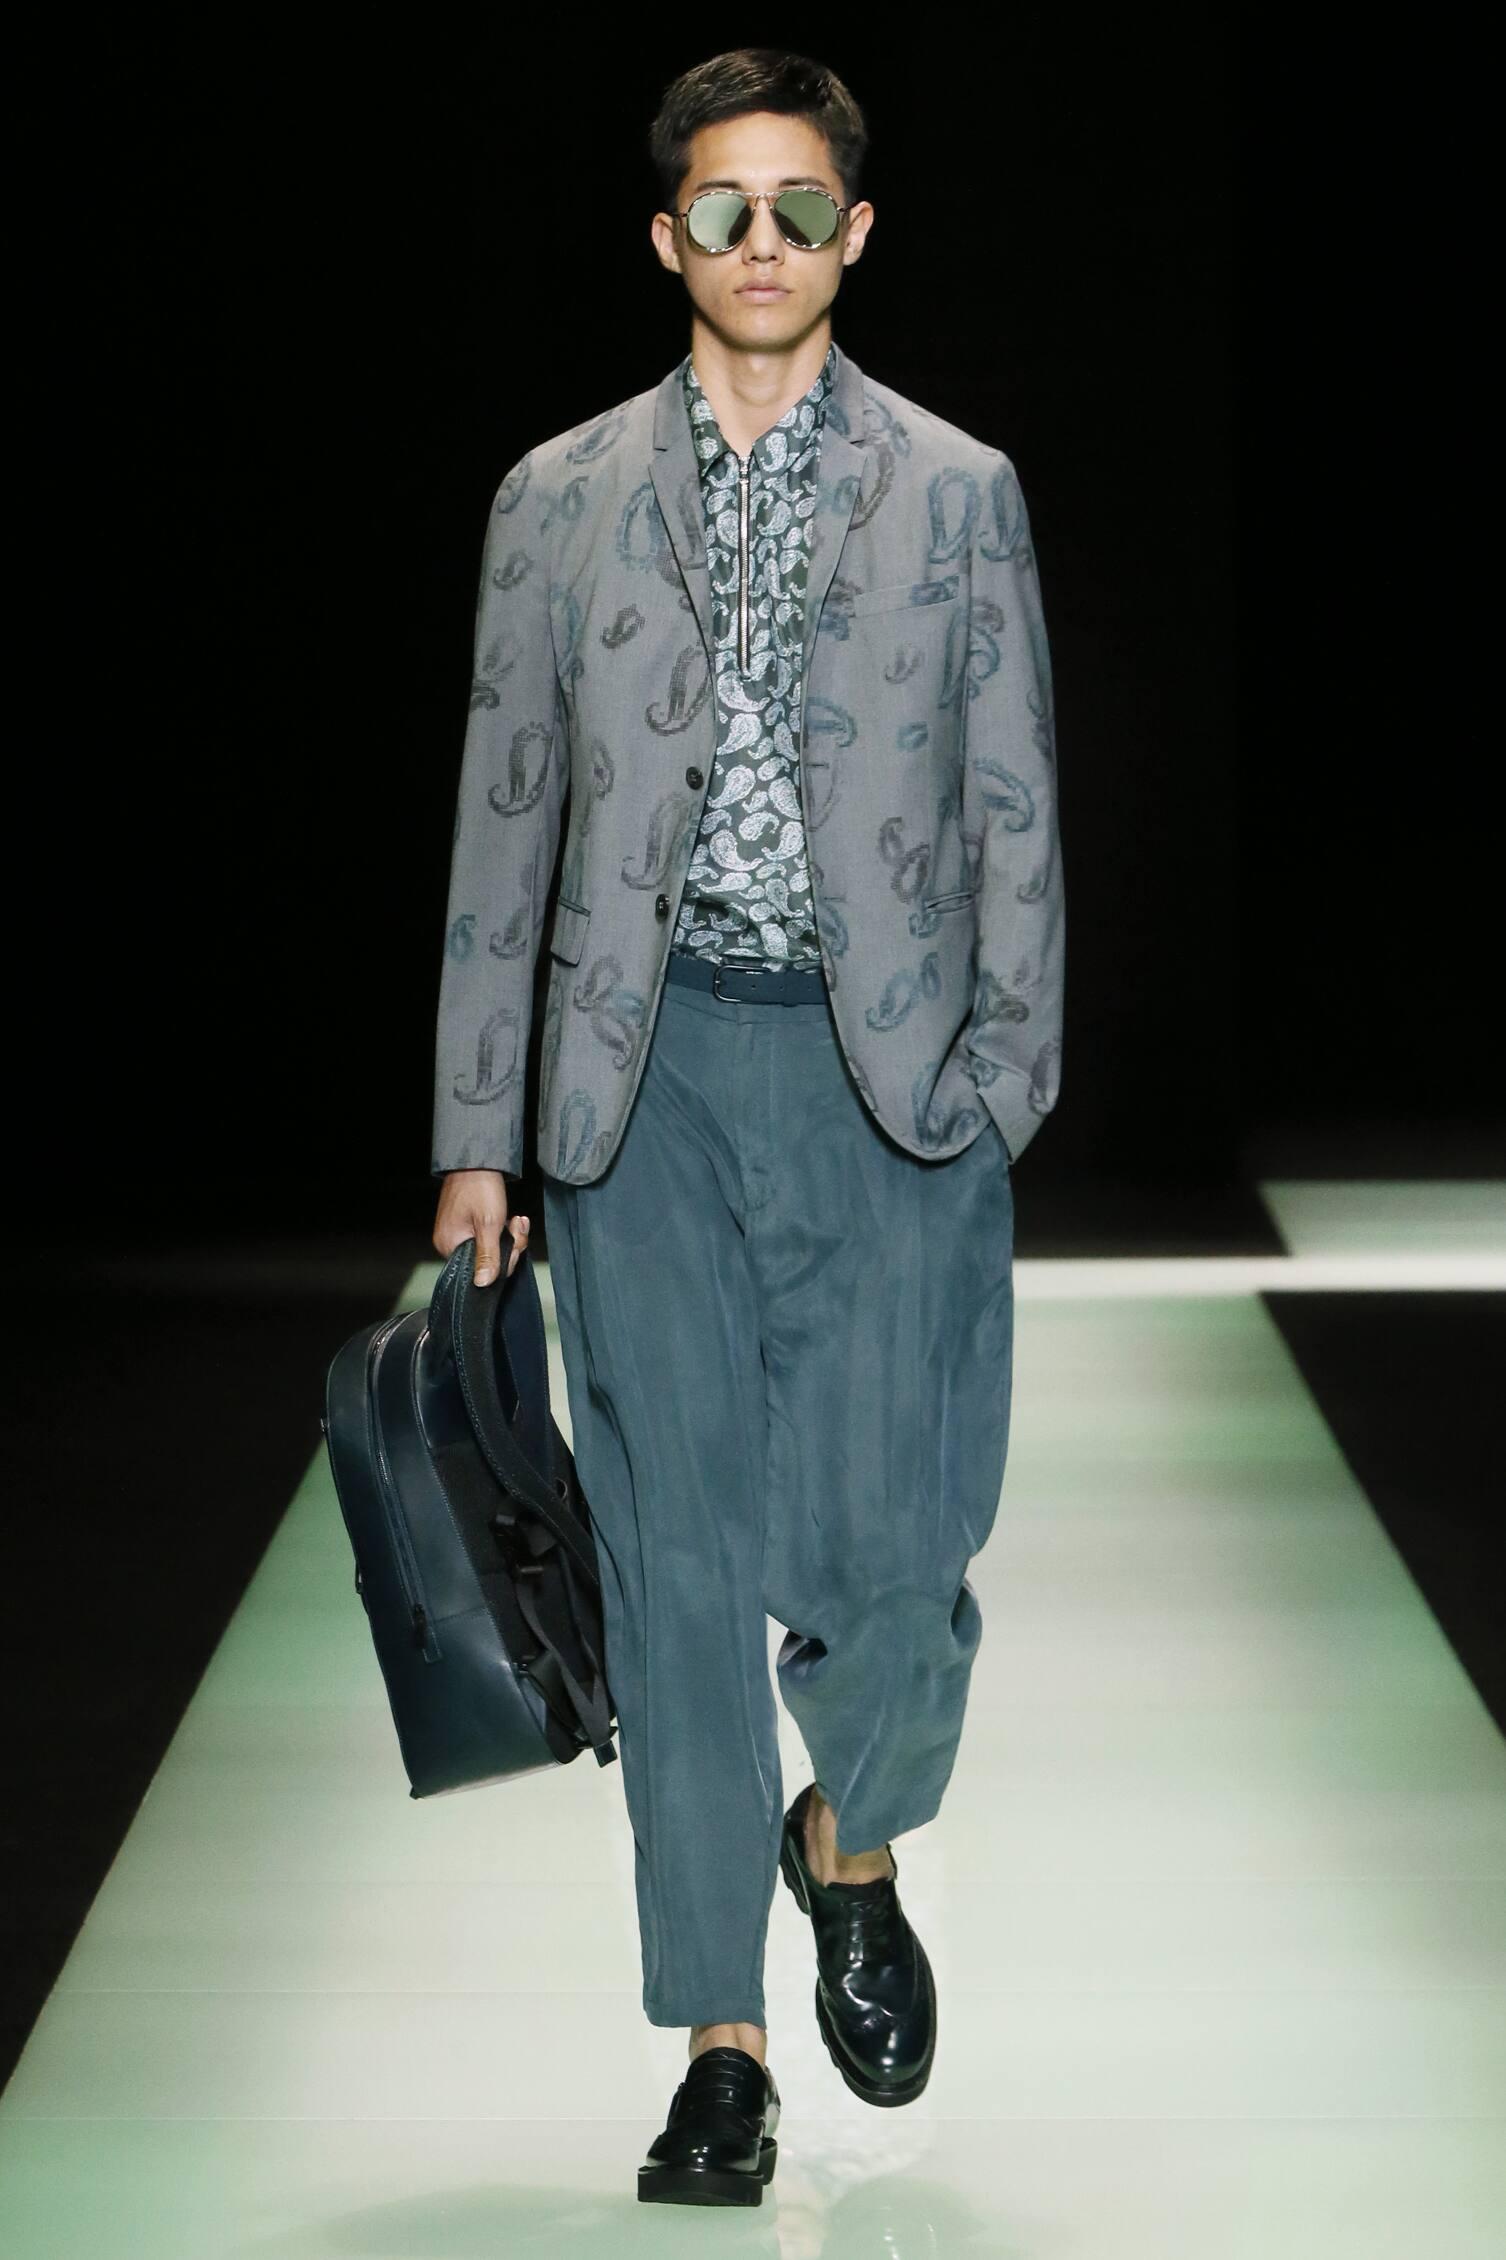 EMPORIO ARMANI SPRING SUMMER MEN'S COLLECTION | The Skinny ...